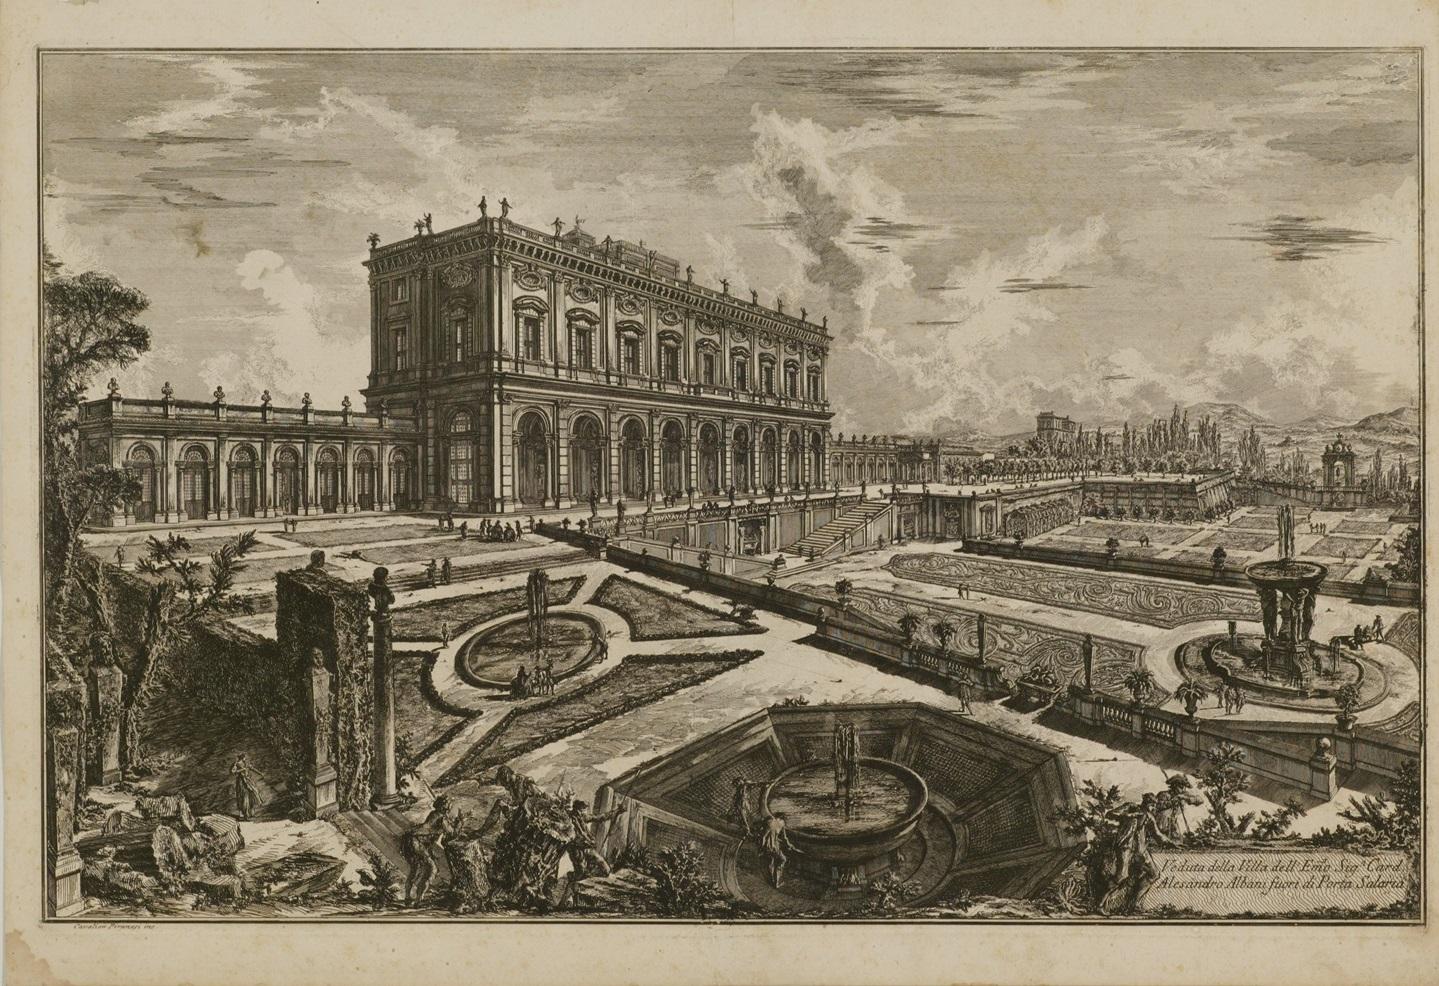 Ricordo di Roma/Память о Риме смотреть фото